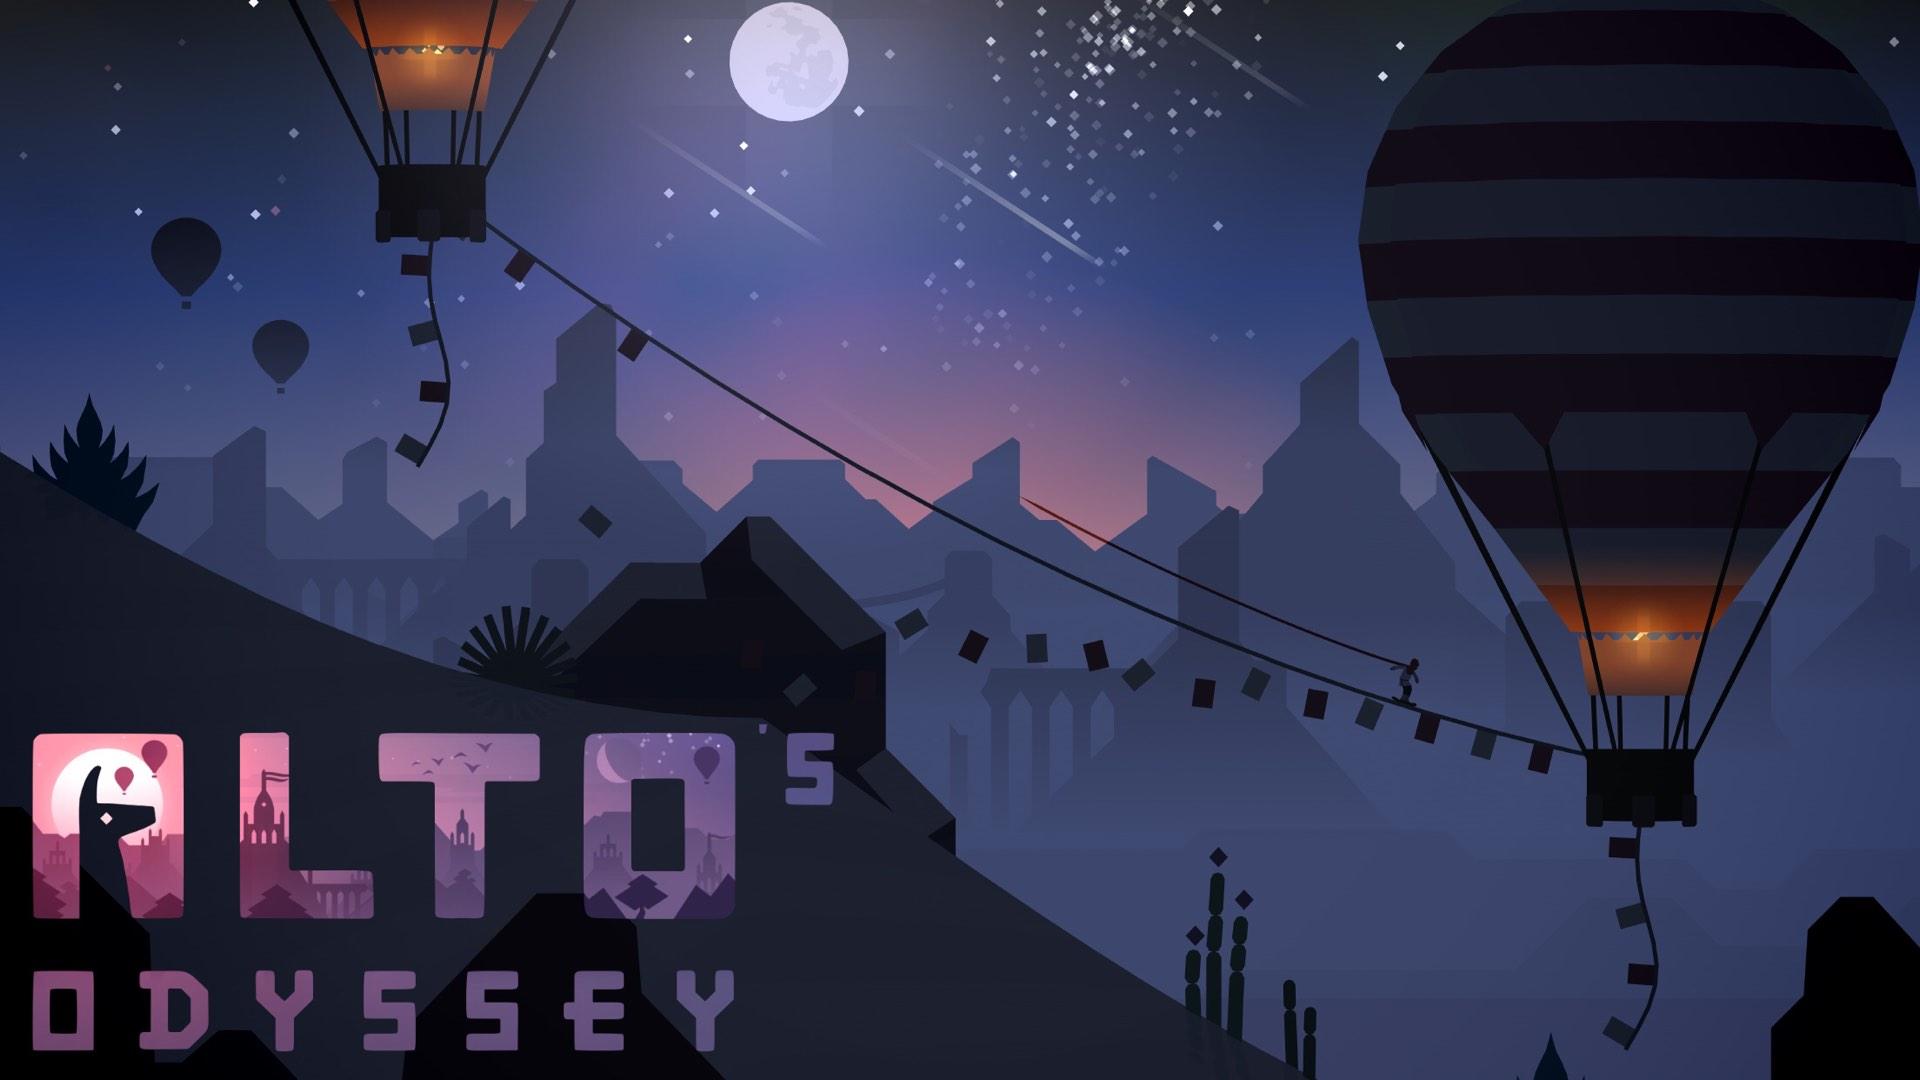 TSS Favorite Games — Alto's Odyssey